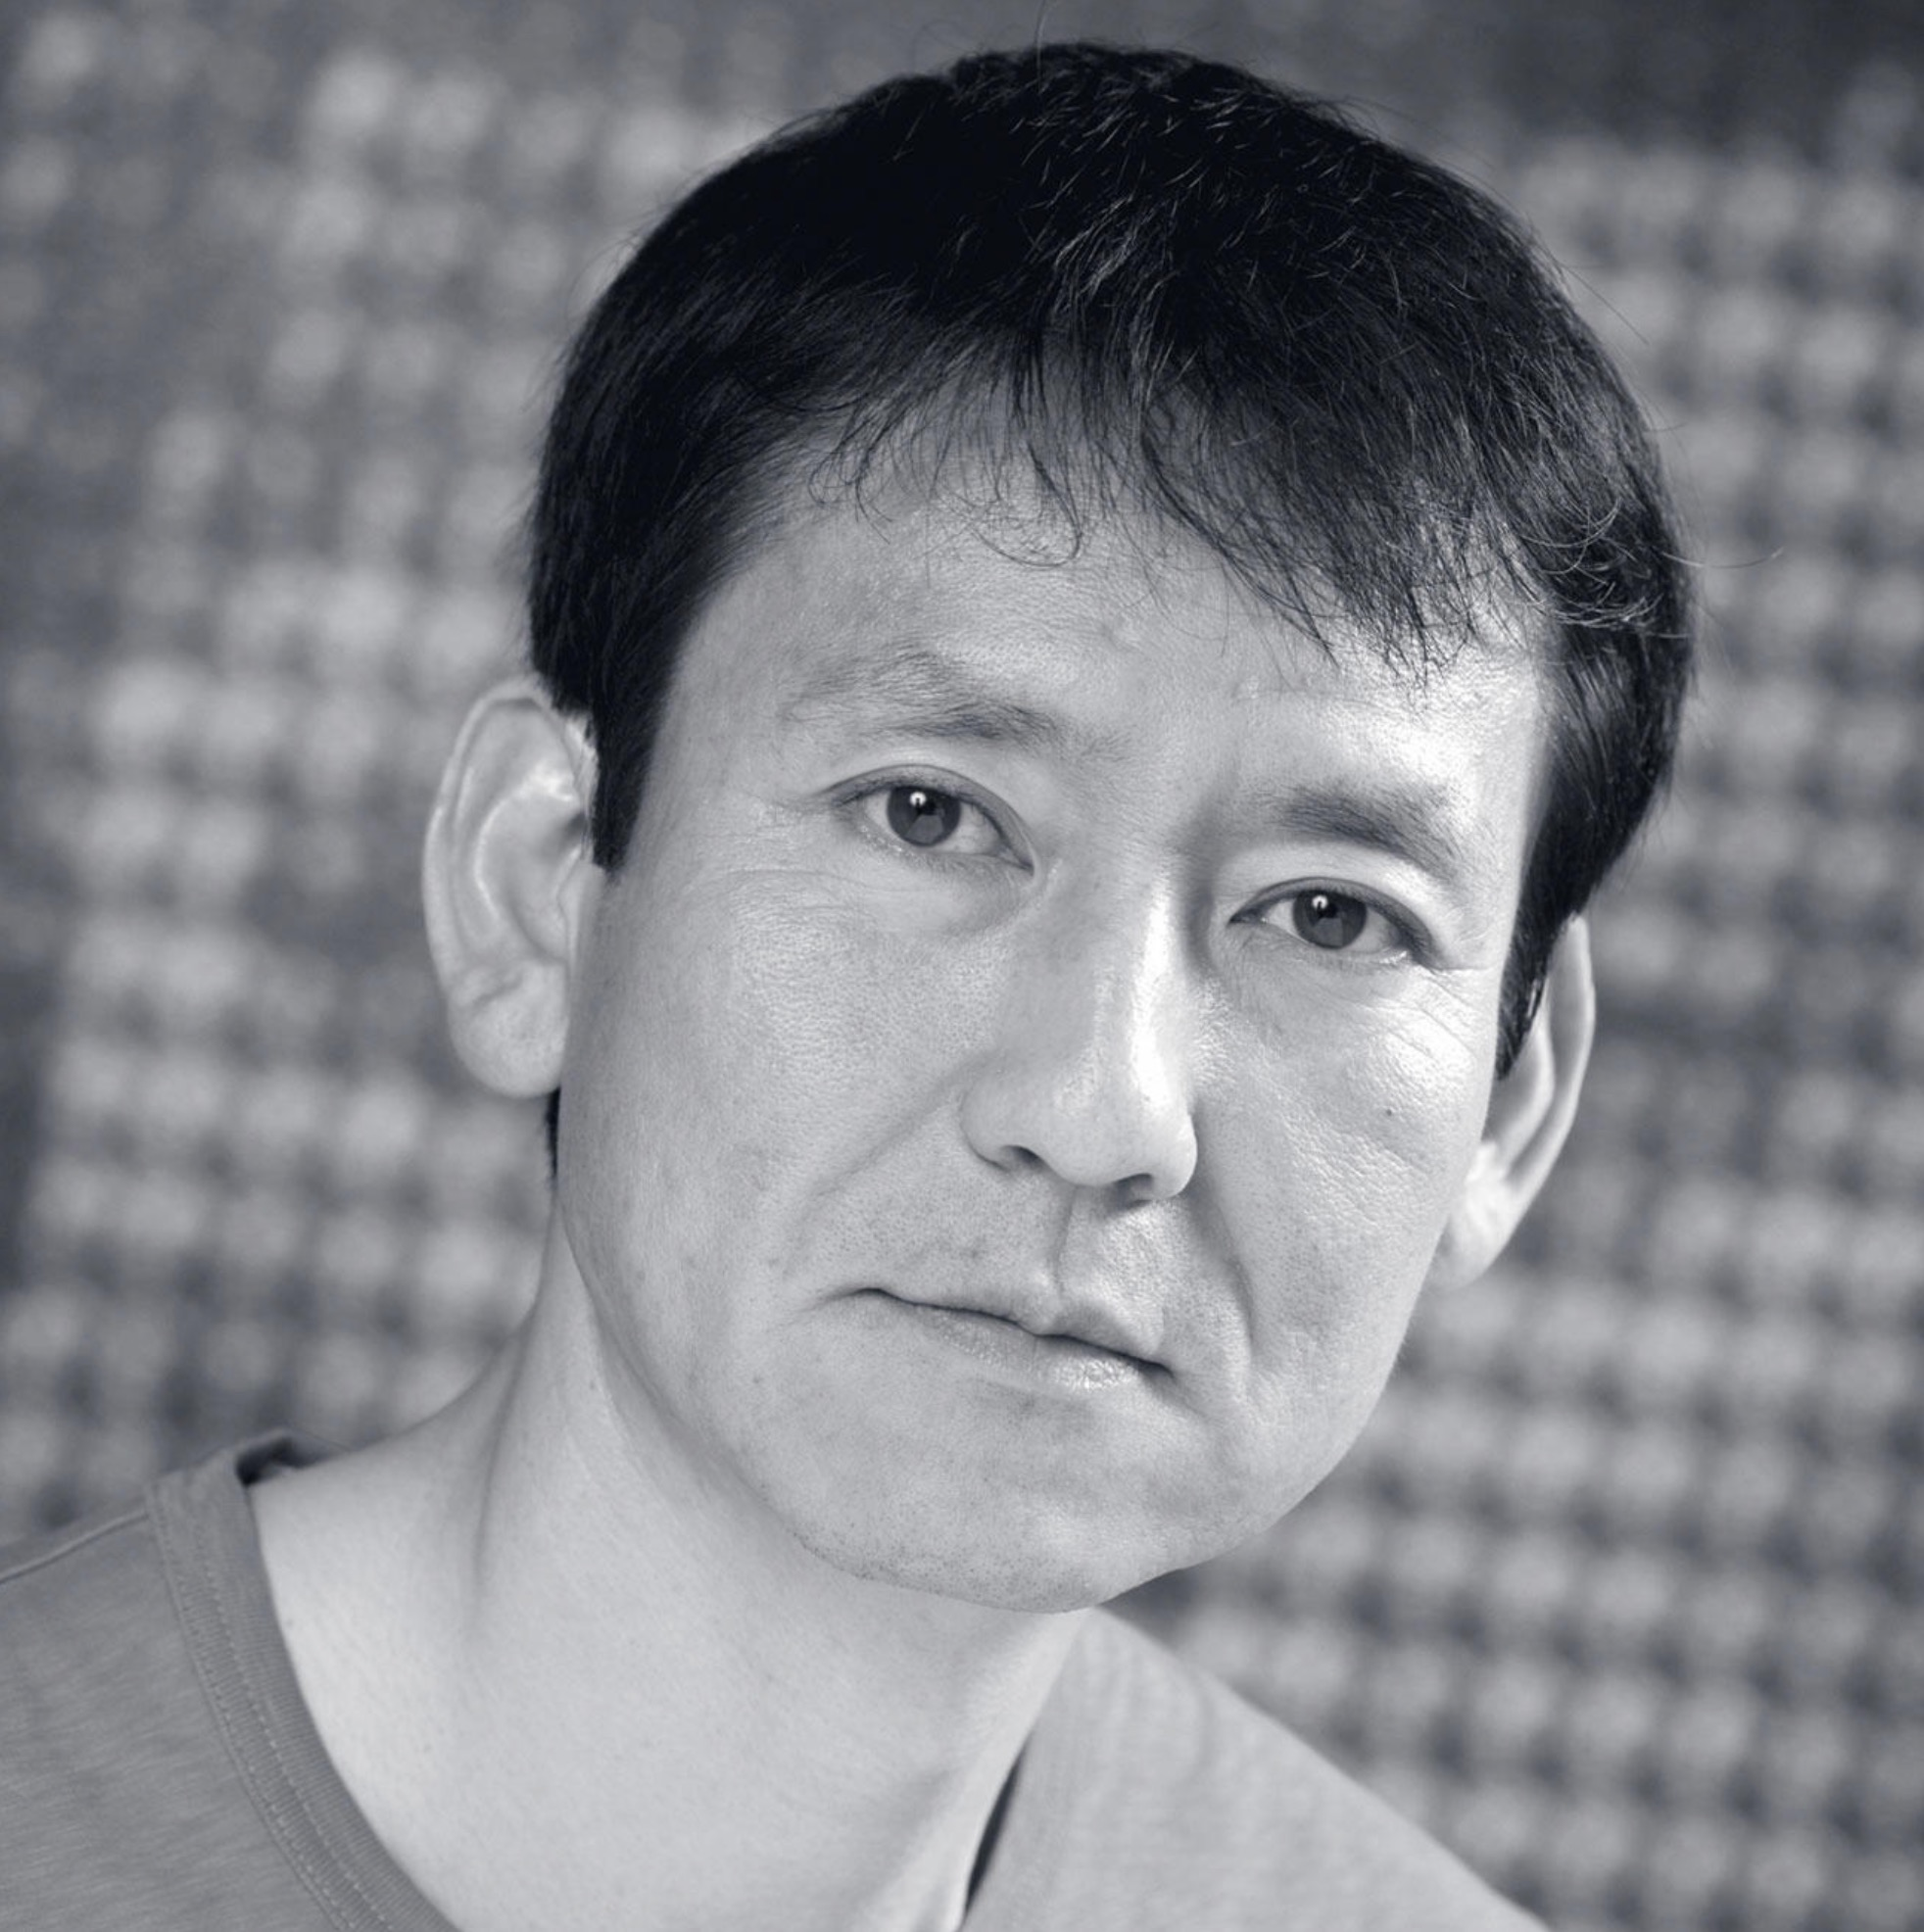 Kim Dong-Yoo